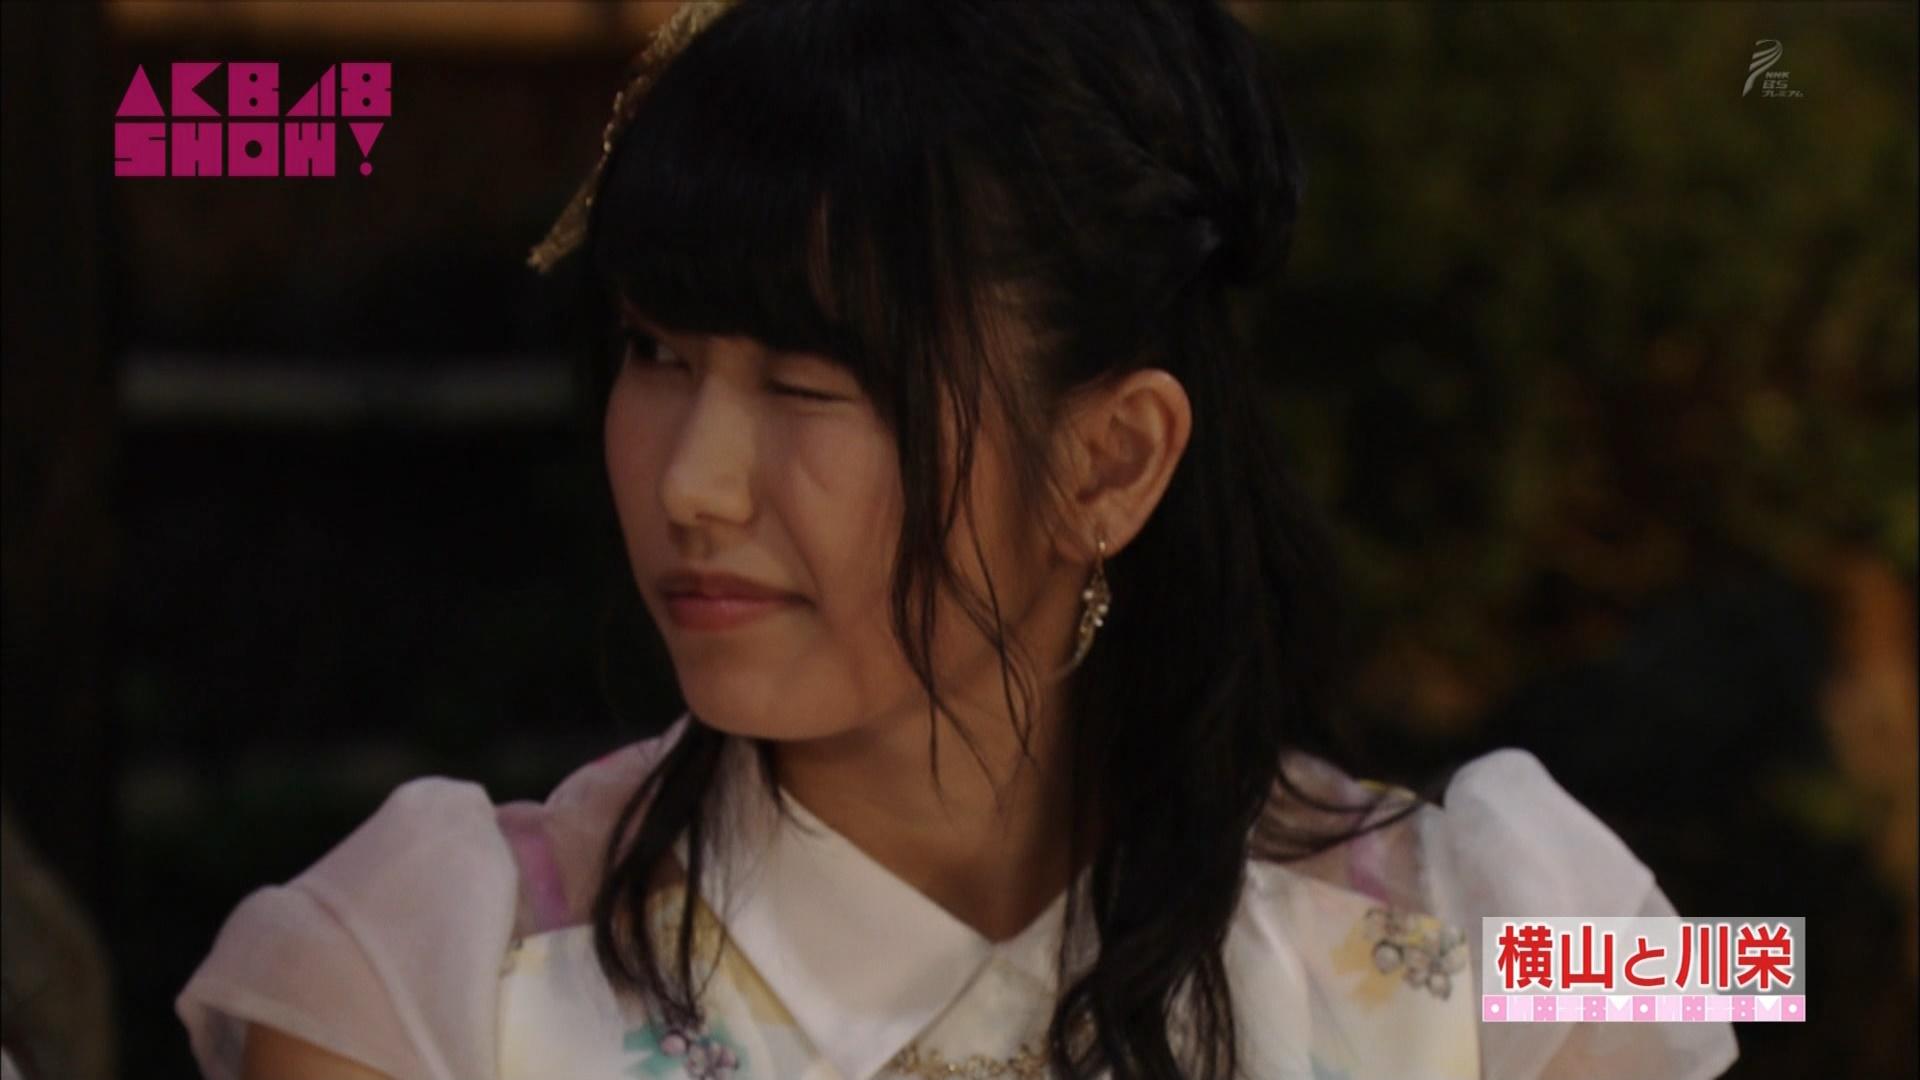 横山由依と川栄李奈 AKB48SHOW! 20140906 (35)